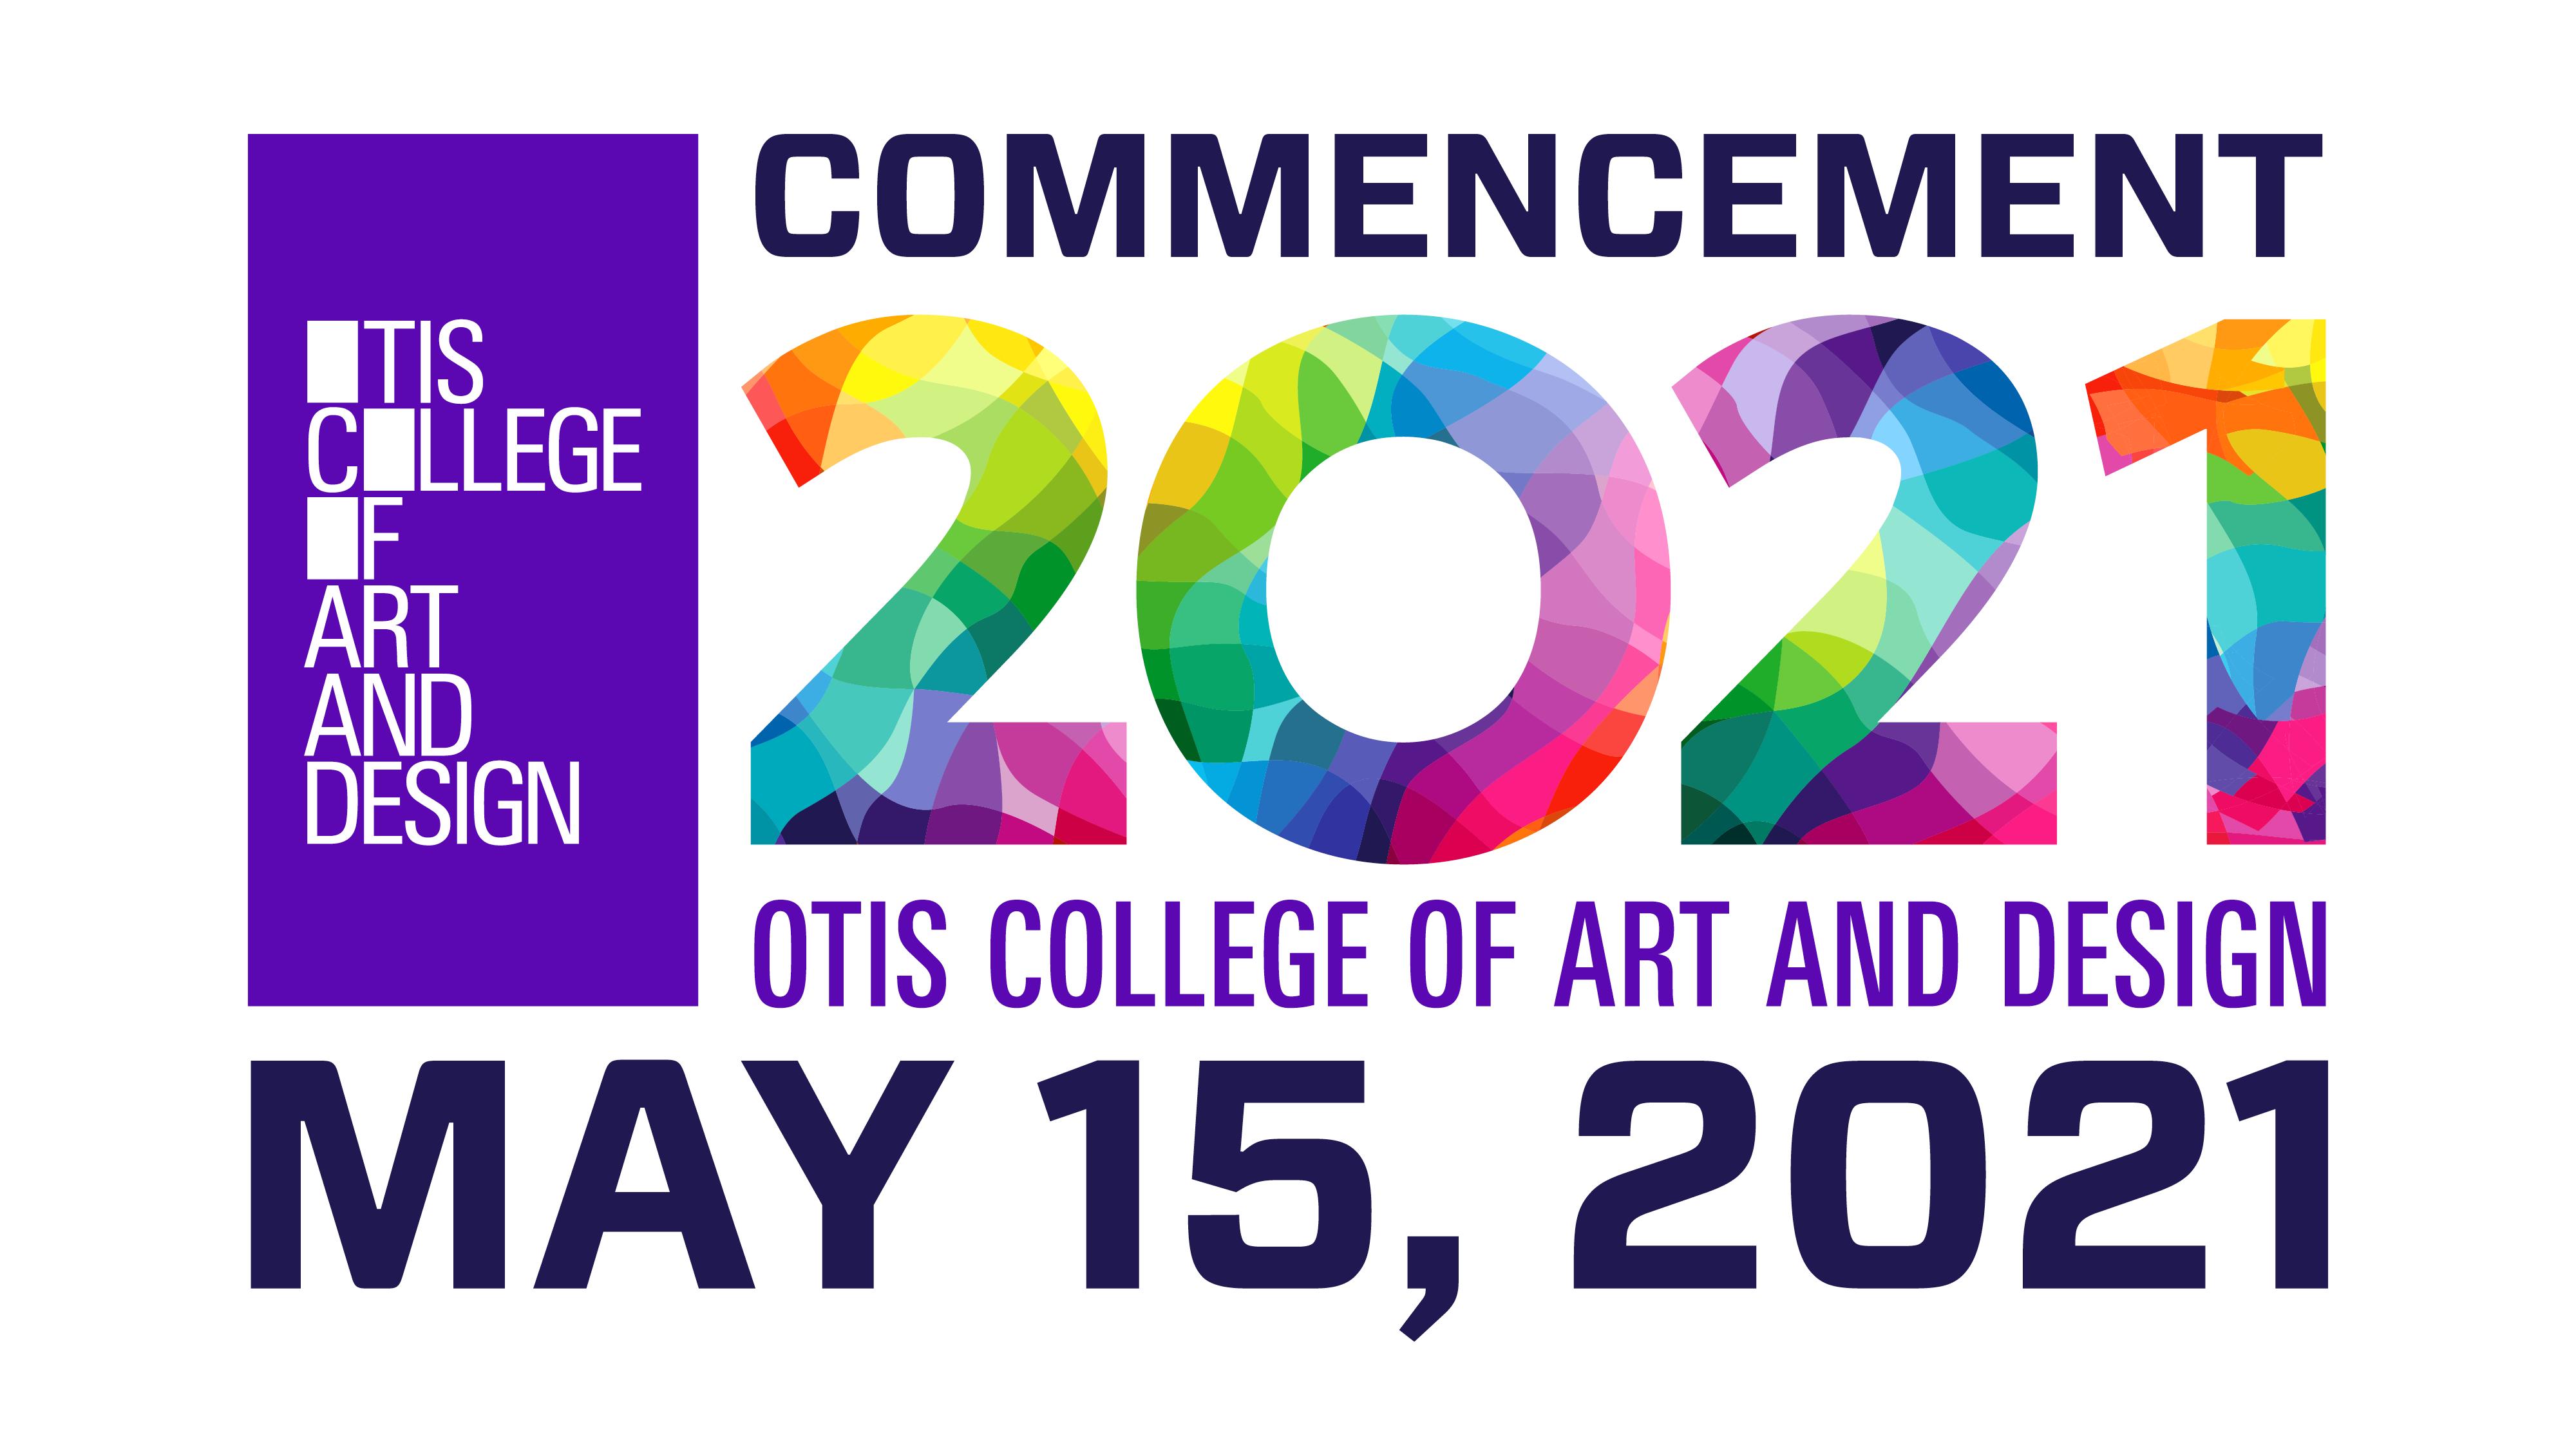 Video of Otis College's 2021 commencement ceremony